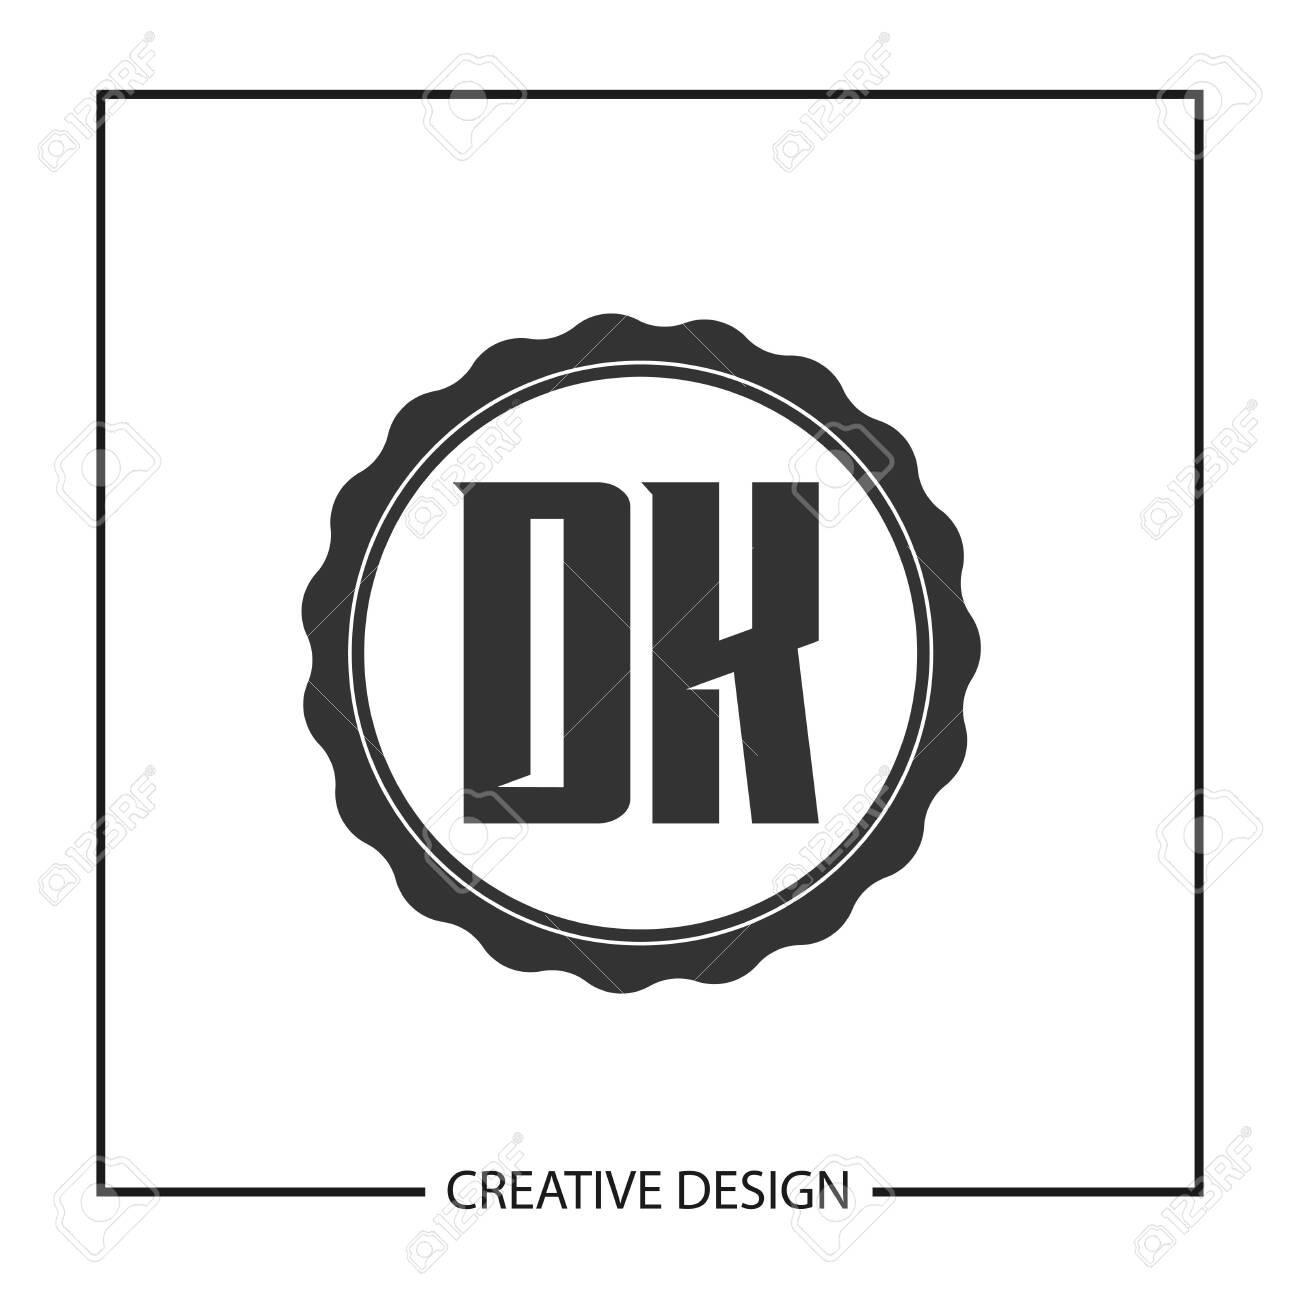 Initial Letter DK Logo Template Design Vector Illustration - 113874104